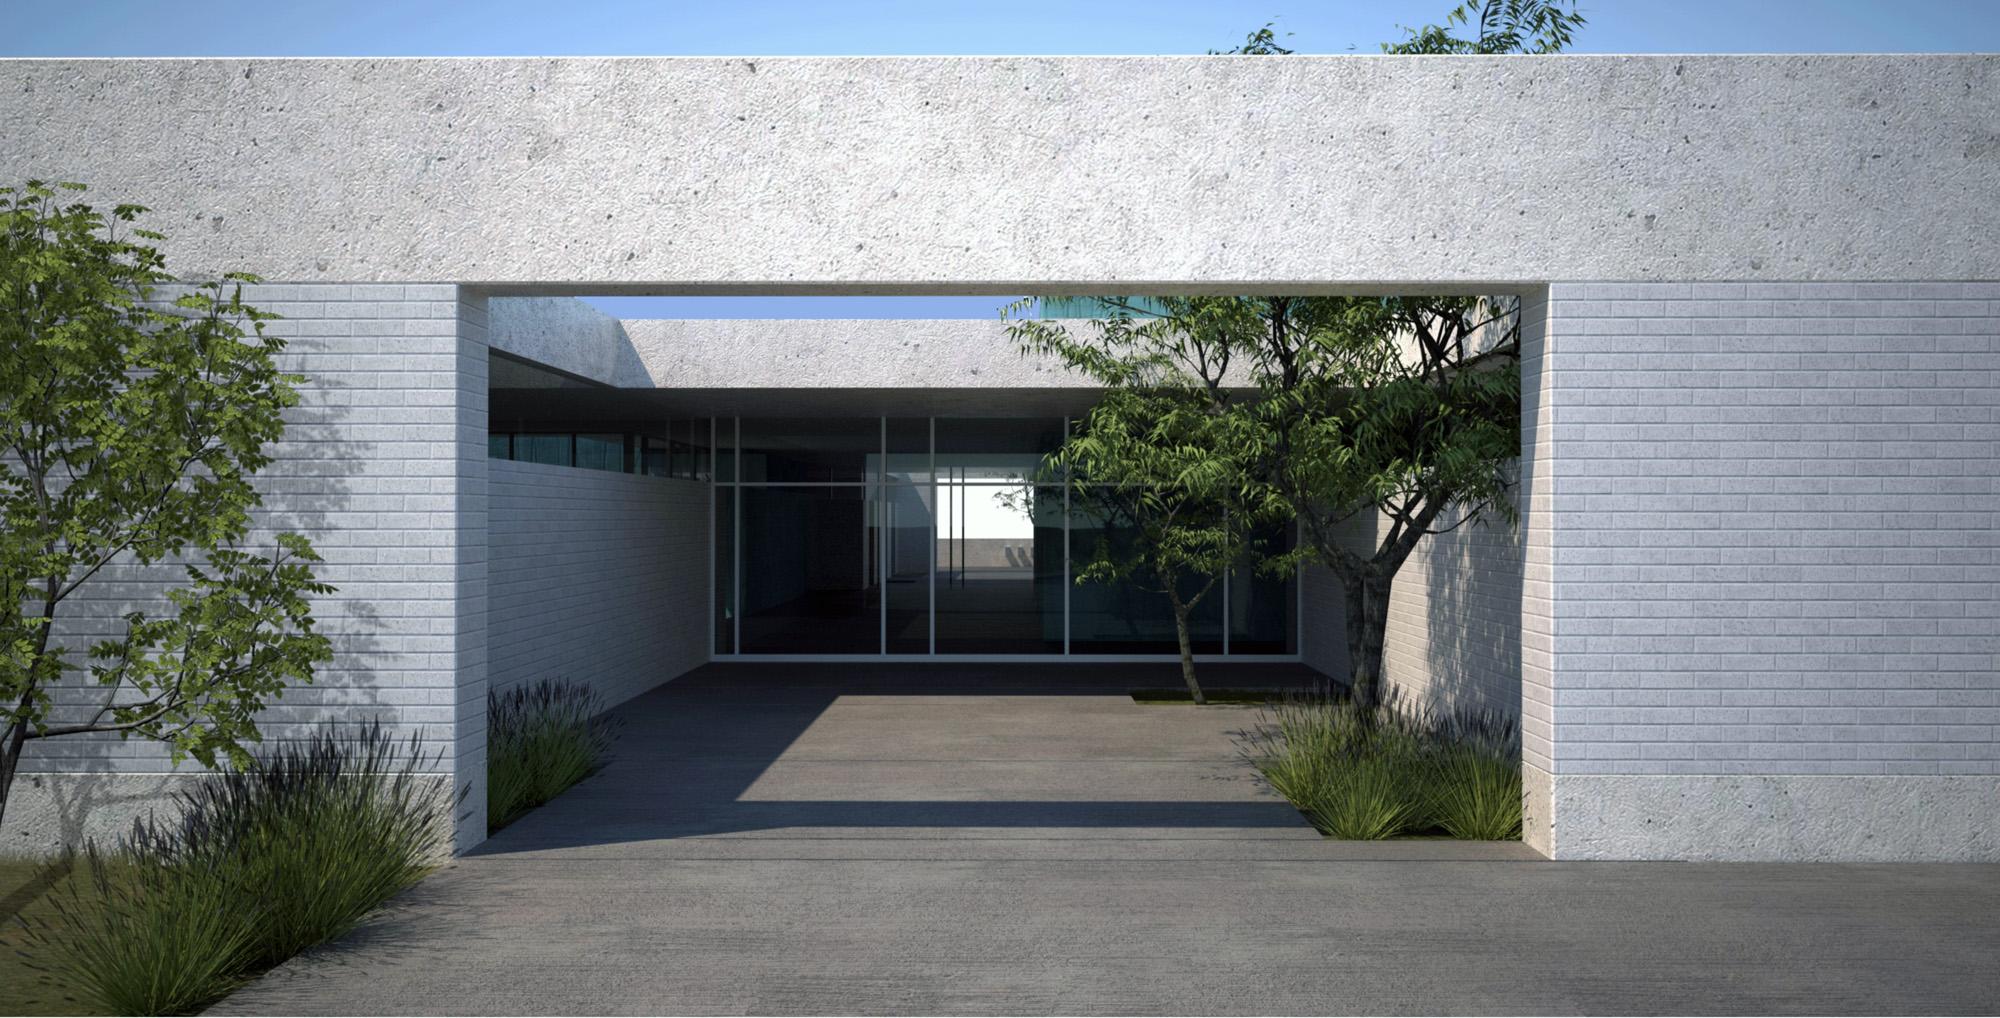 02 Entrance View